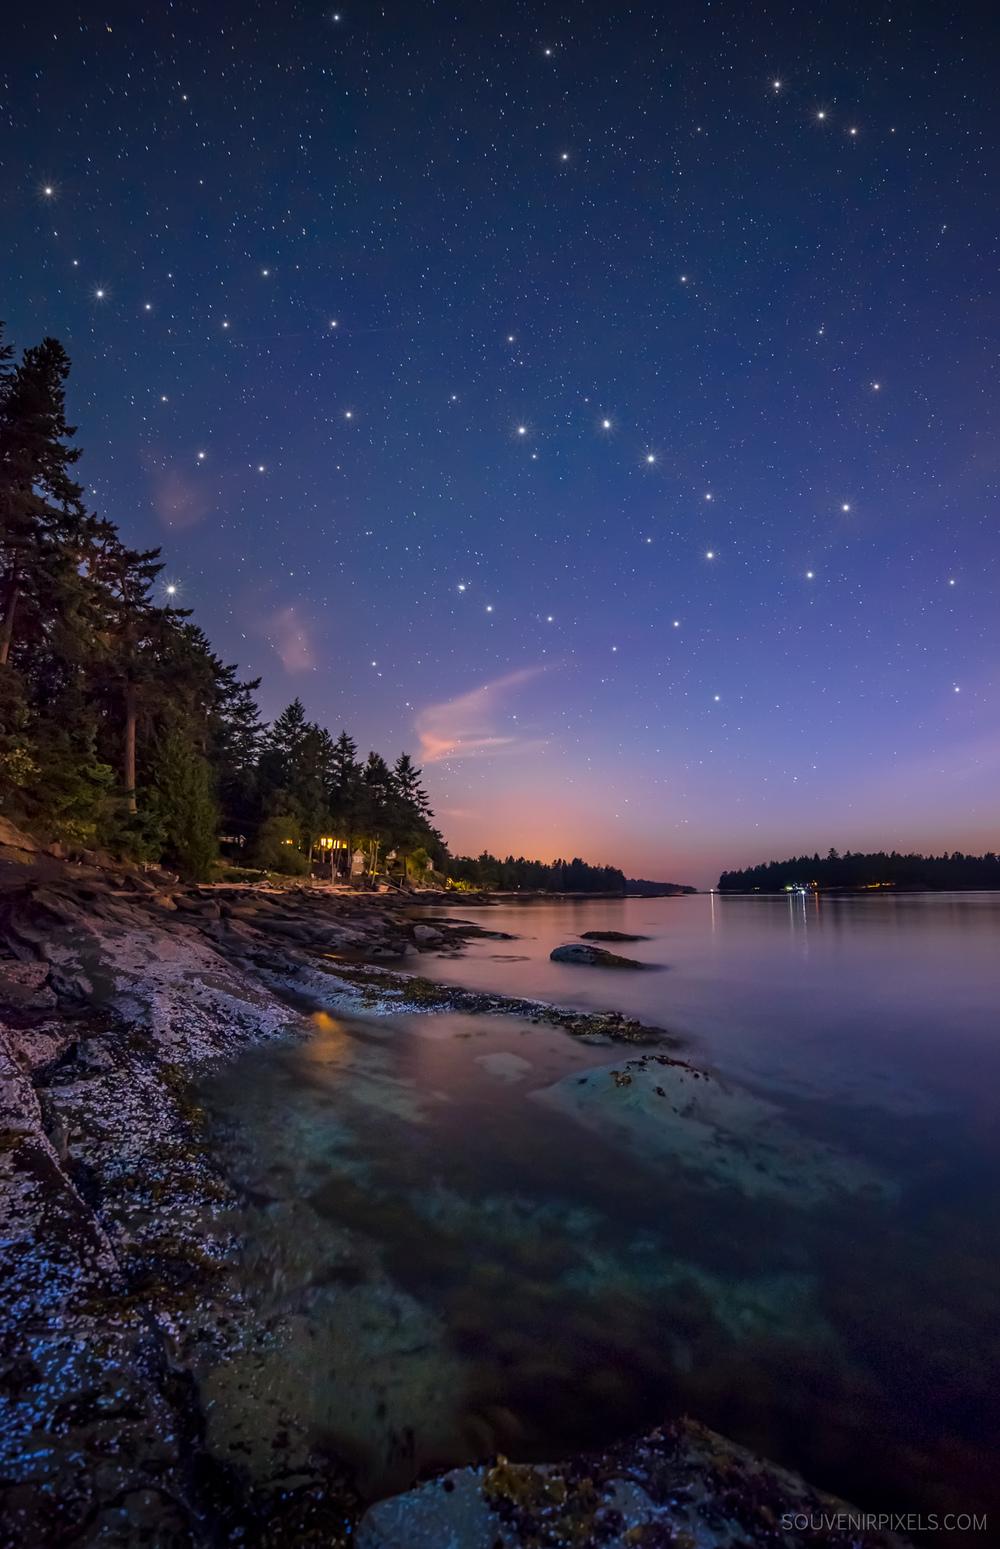 P0513-Galiano Island Stars-XLarge.jpg